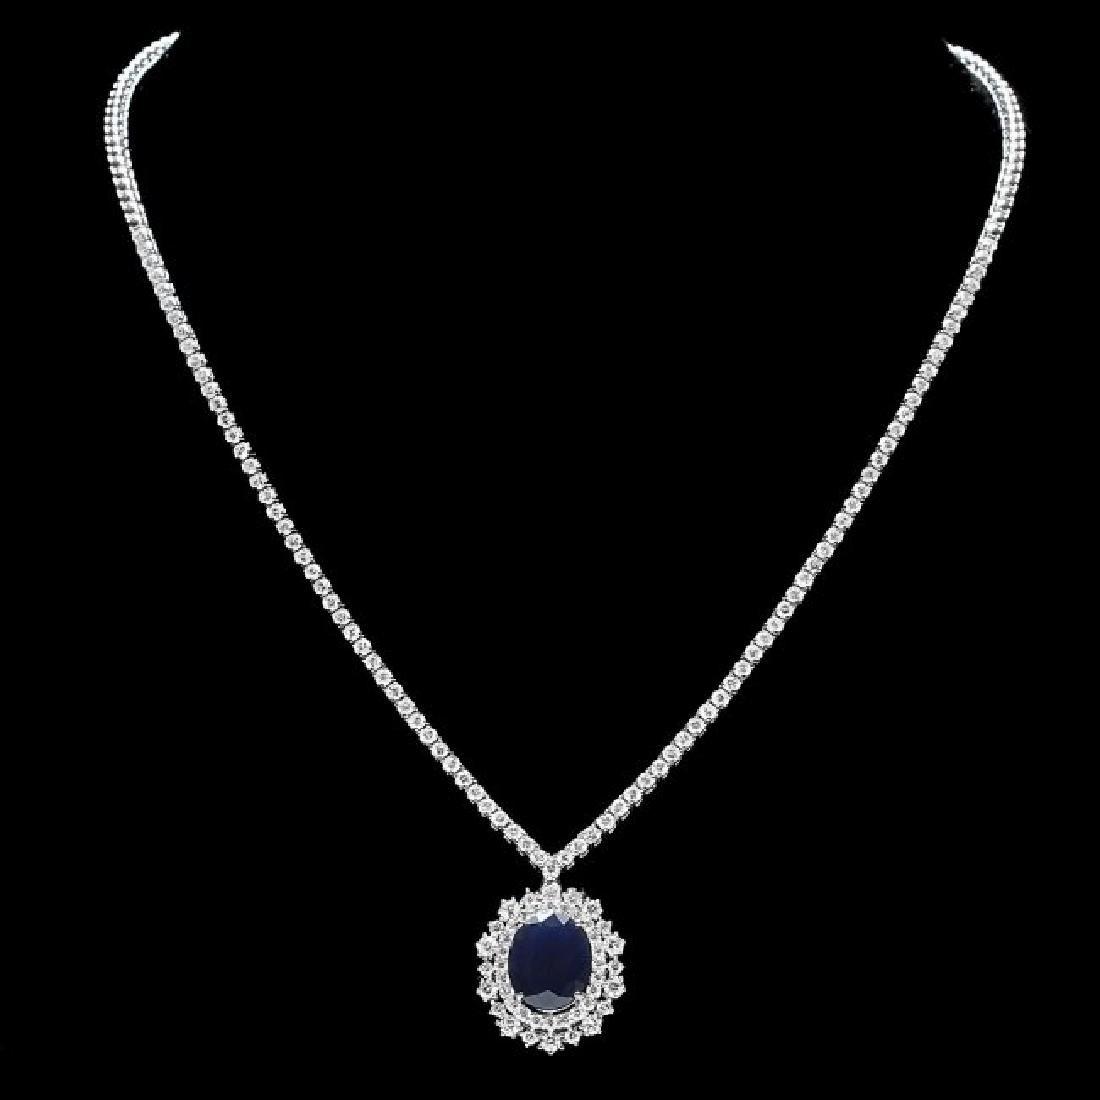 18k Gold 6ct Sapphire 5.00ct Diamond Necklace